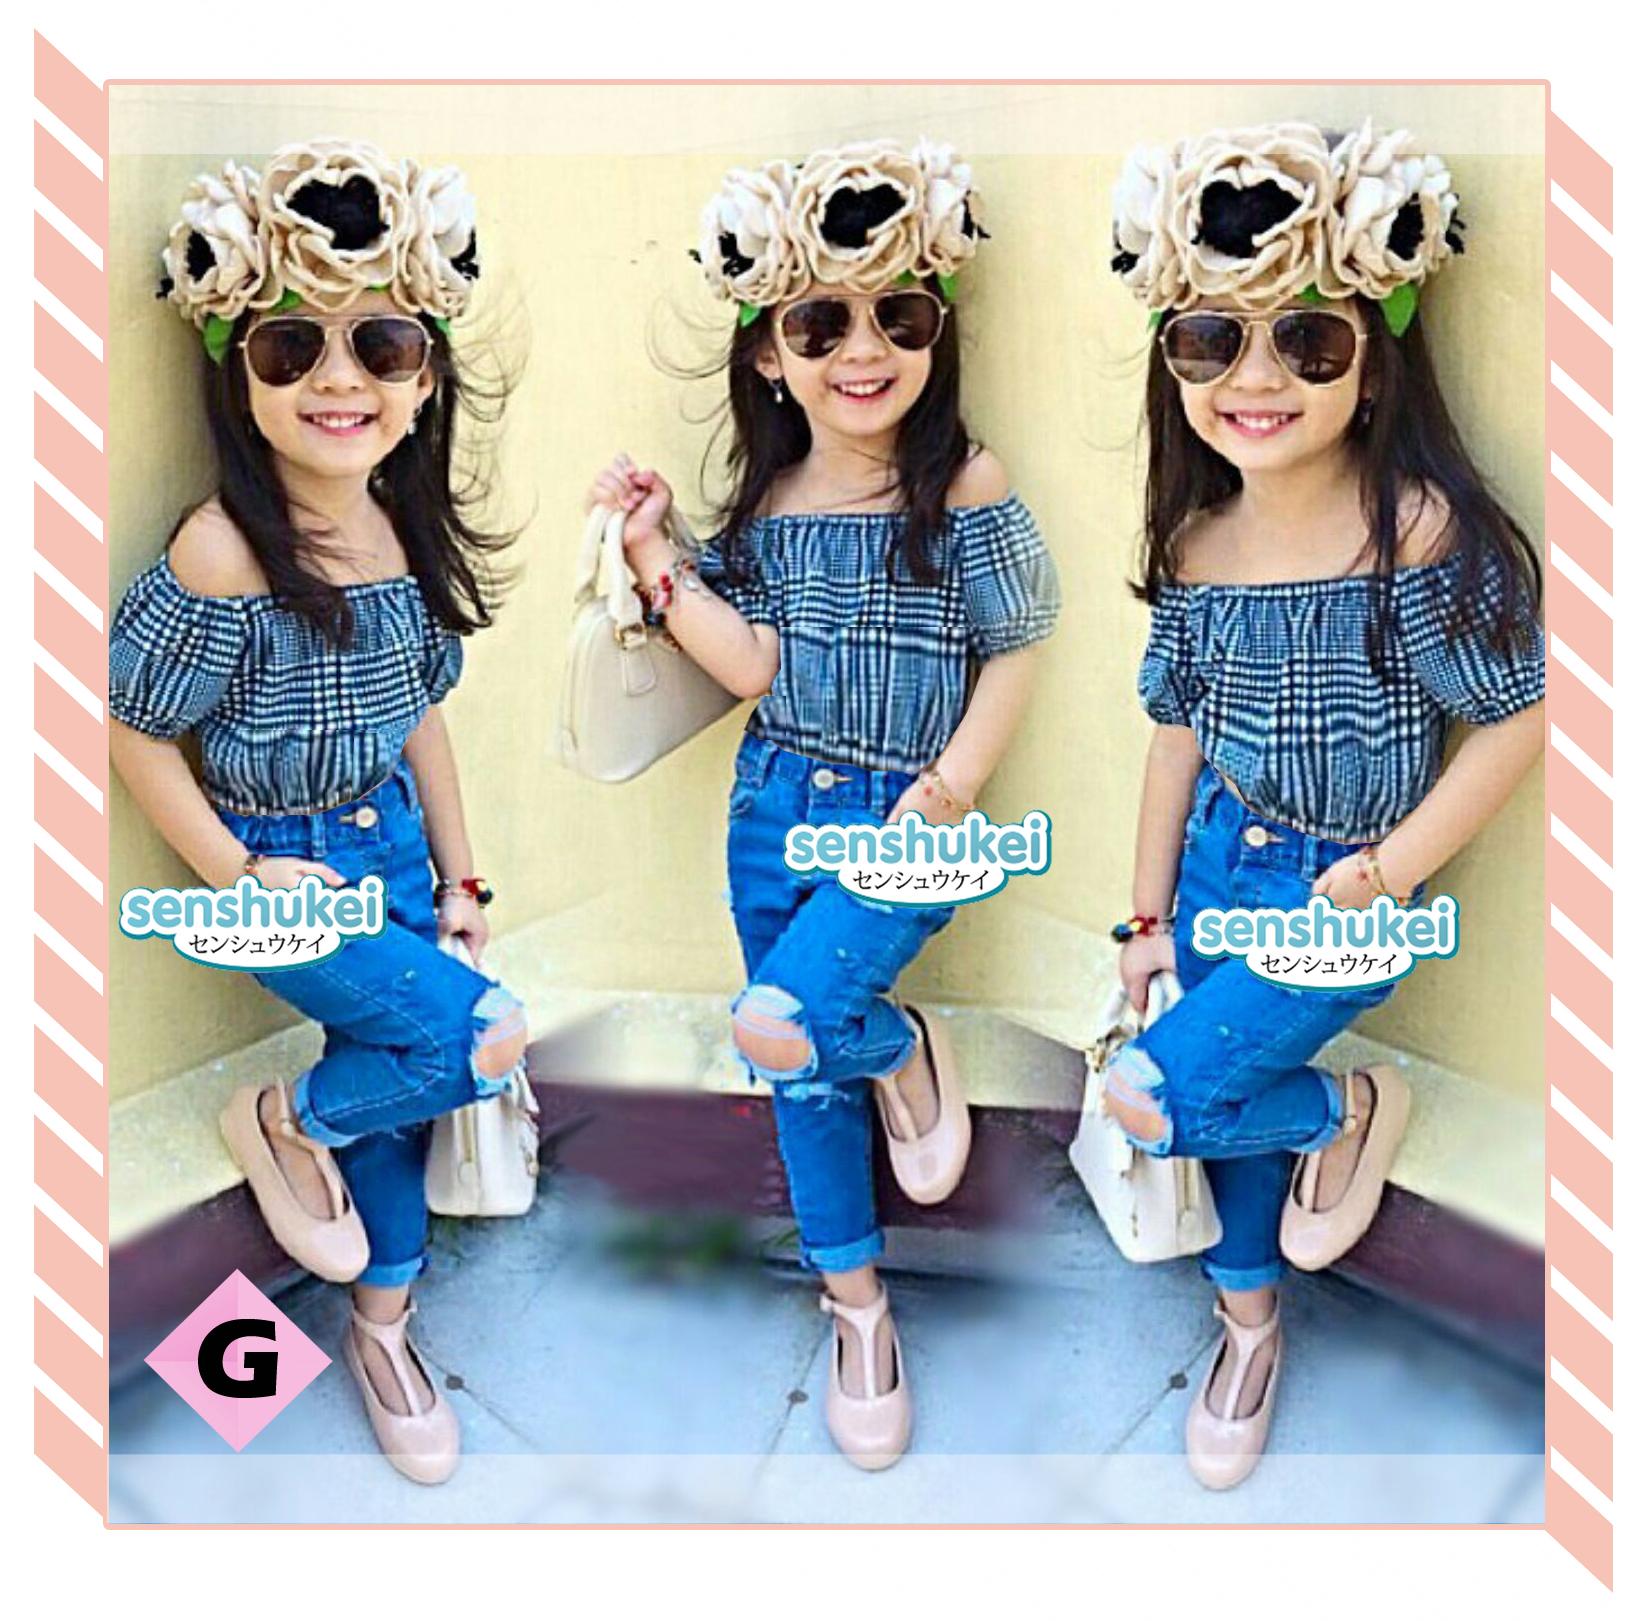 Jual Baju Anak - Senshukei Blue Sabrina set ripped jeans - butiknyacc | Tokopedia